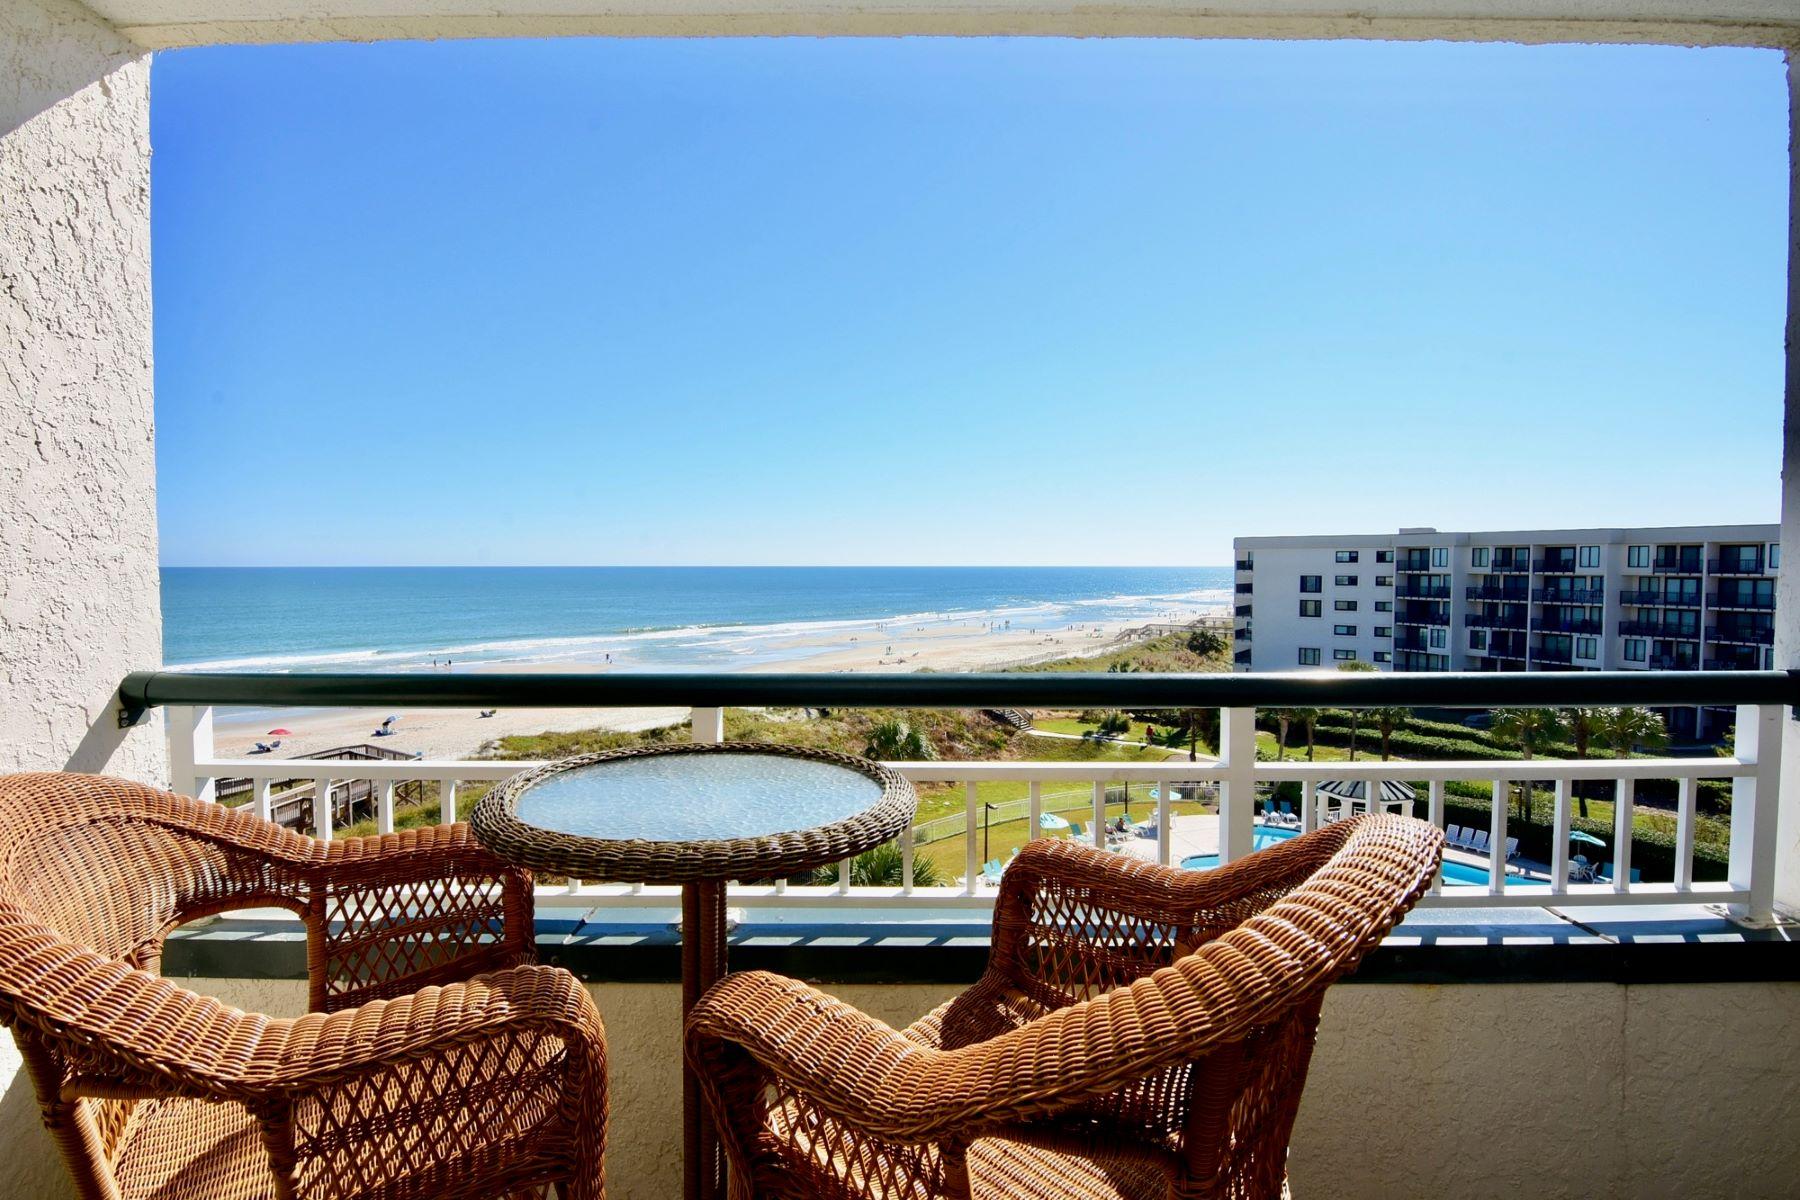 شقة بعمارة للـ Sale في 601 Retreat Beach Circle, 505, Pawleys Island, SC 601 Retreat Beach Circle Cir 505, Pawleys Island, South Carolina, 29585 United States